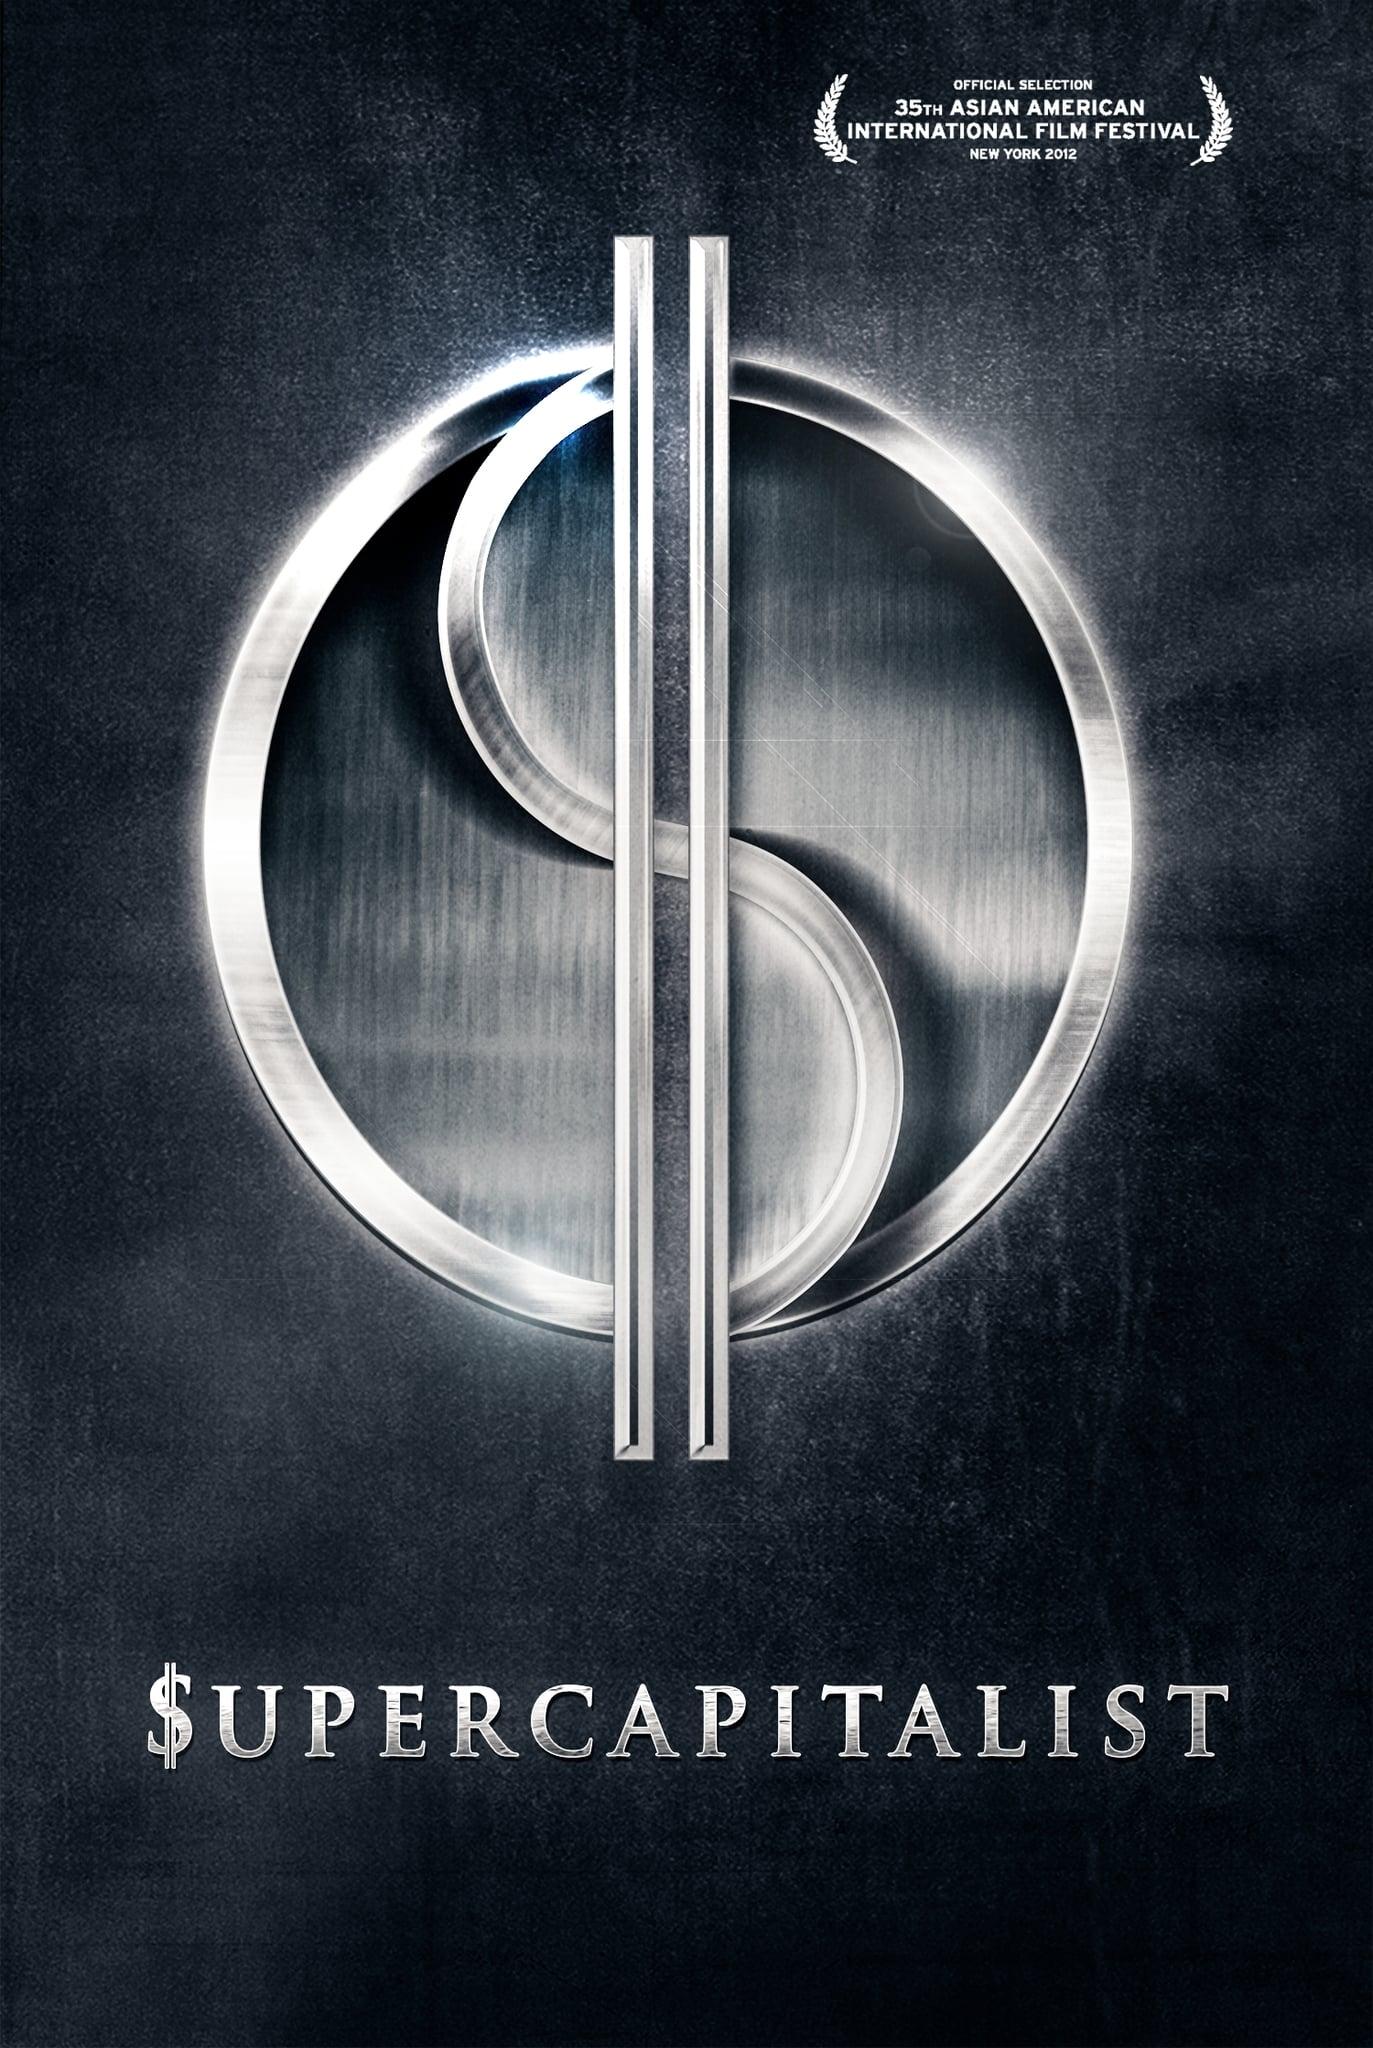 Supercapitalista